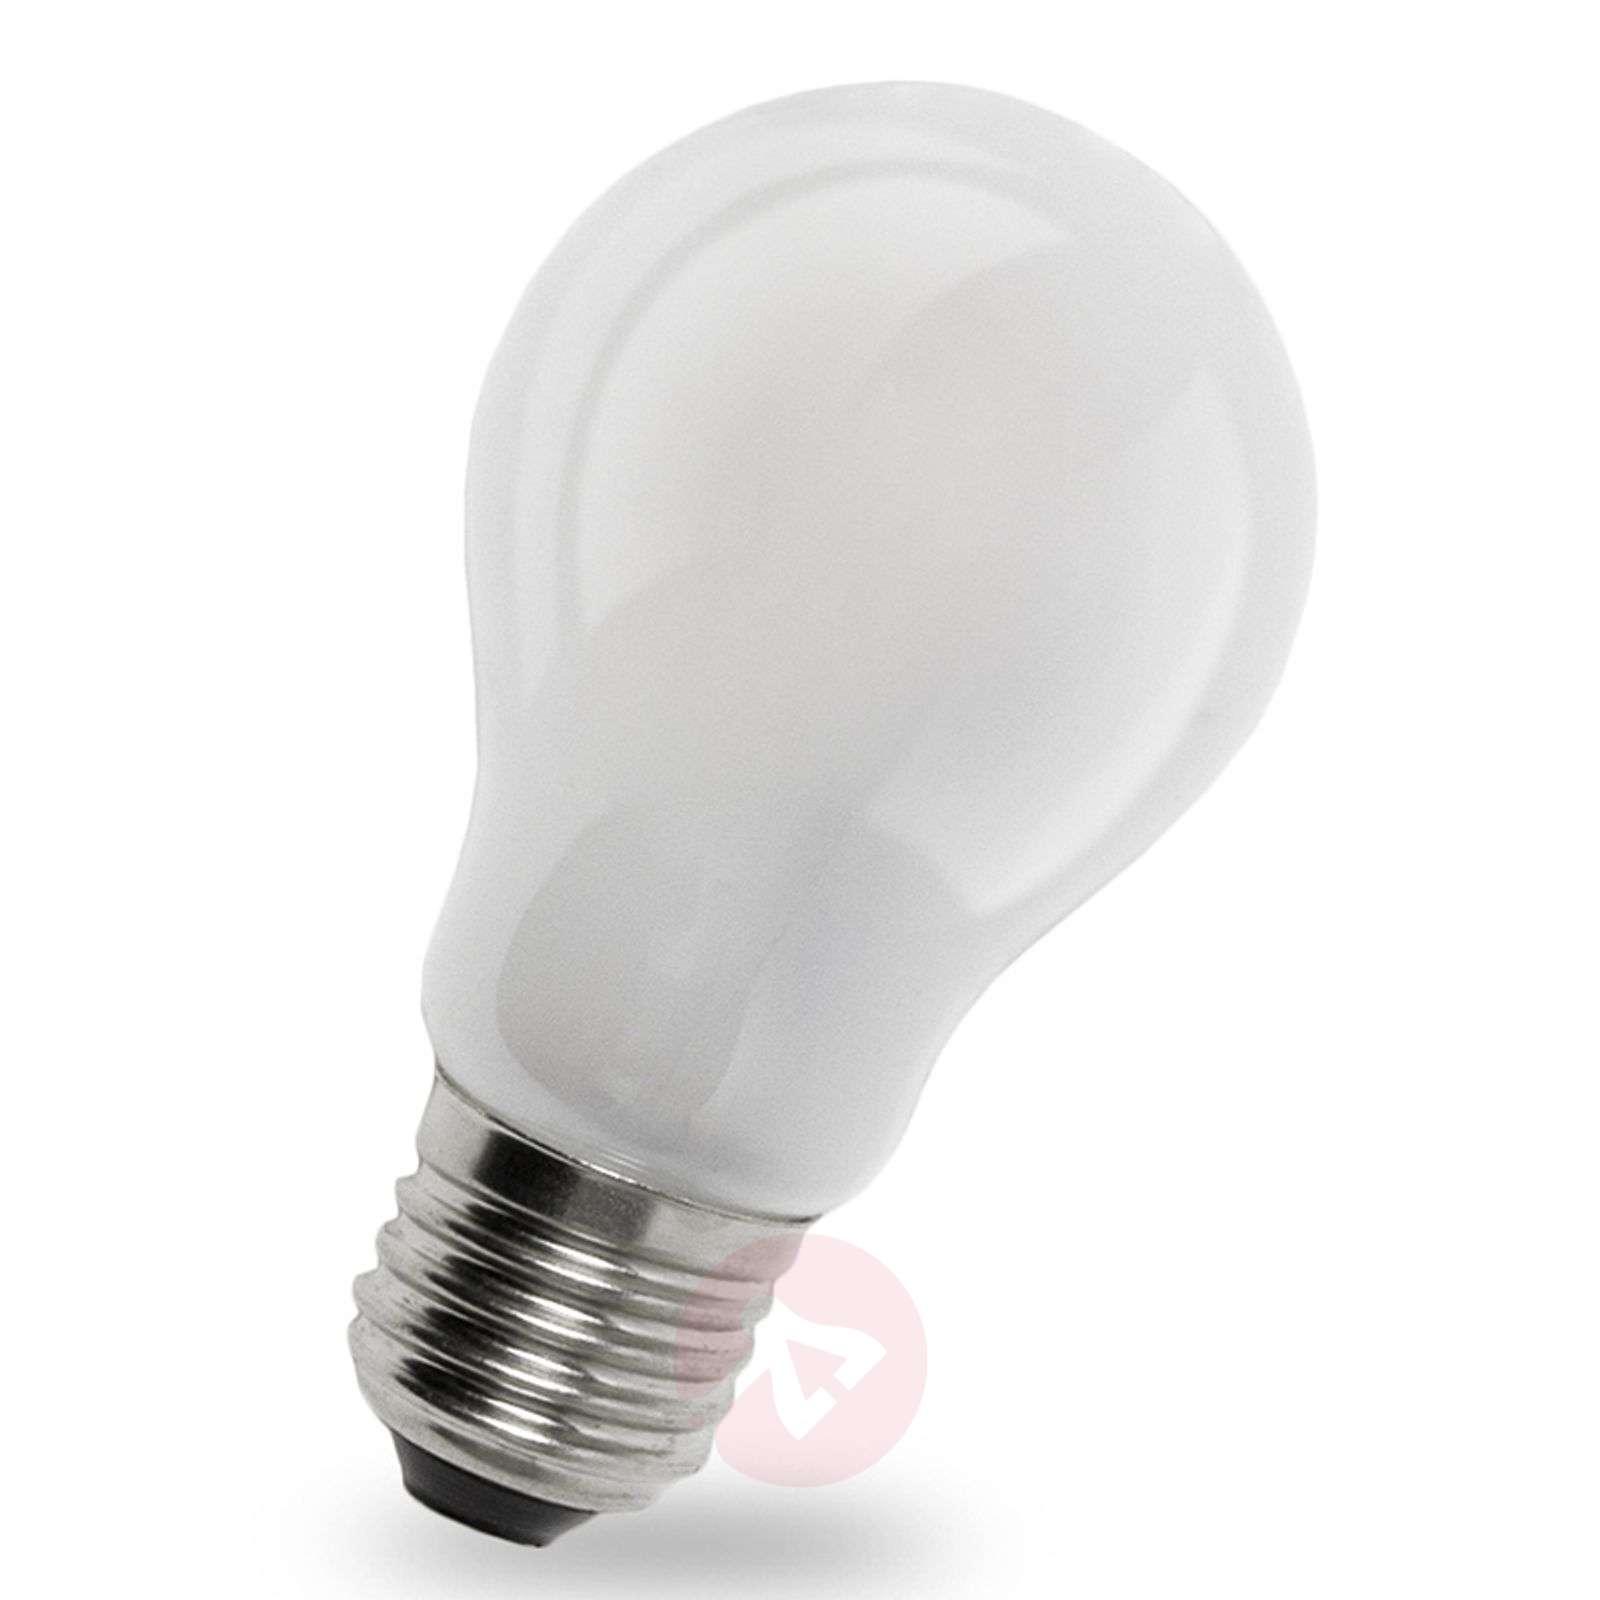 LED-hehkulamppu E27 4W 827, sisäpuoli matta-7254970-01